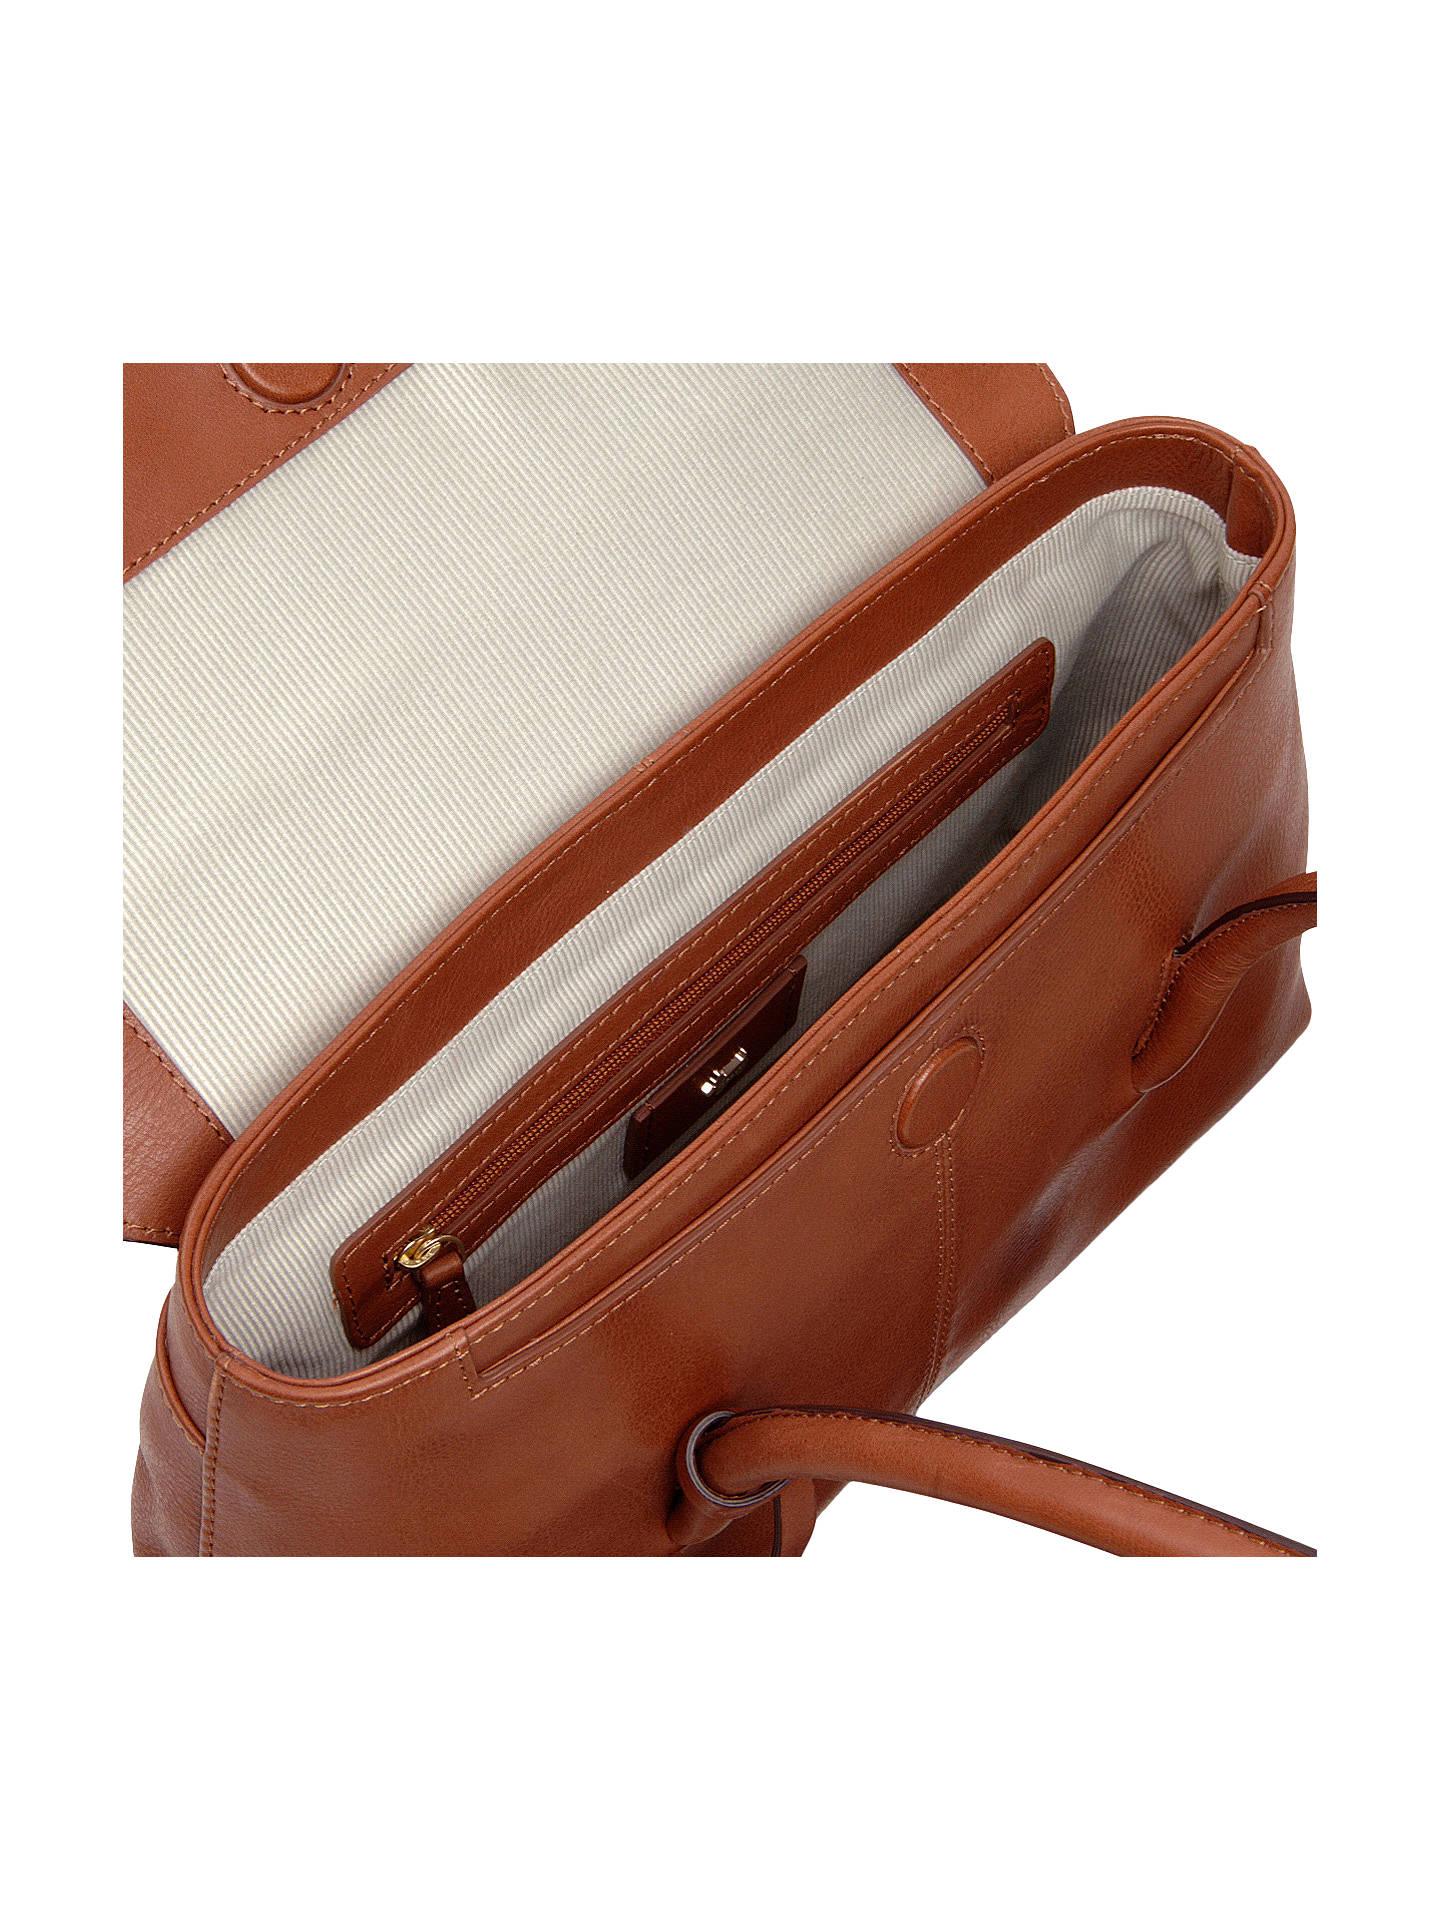 40ecde8d55f9 ... Buy Radley Burnham Beeches Leather Medium Flapover Tote Bag, Tan Online  at johnlewis.com ...